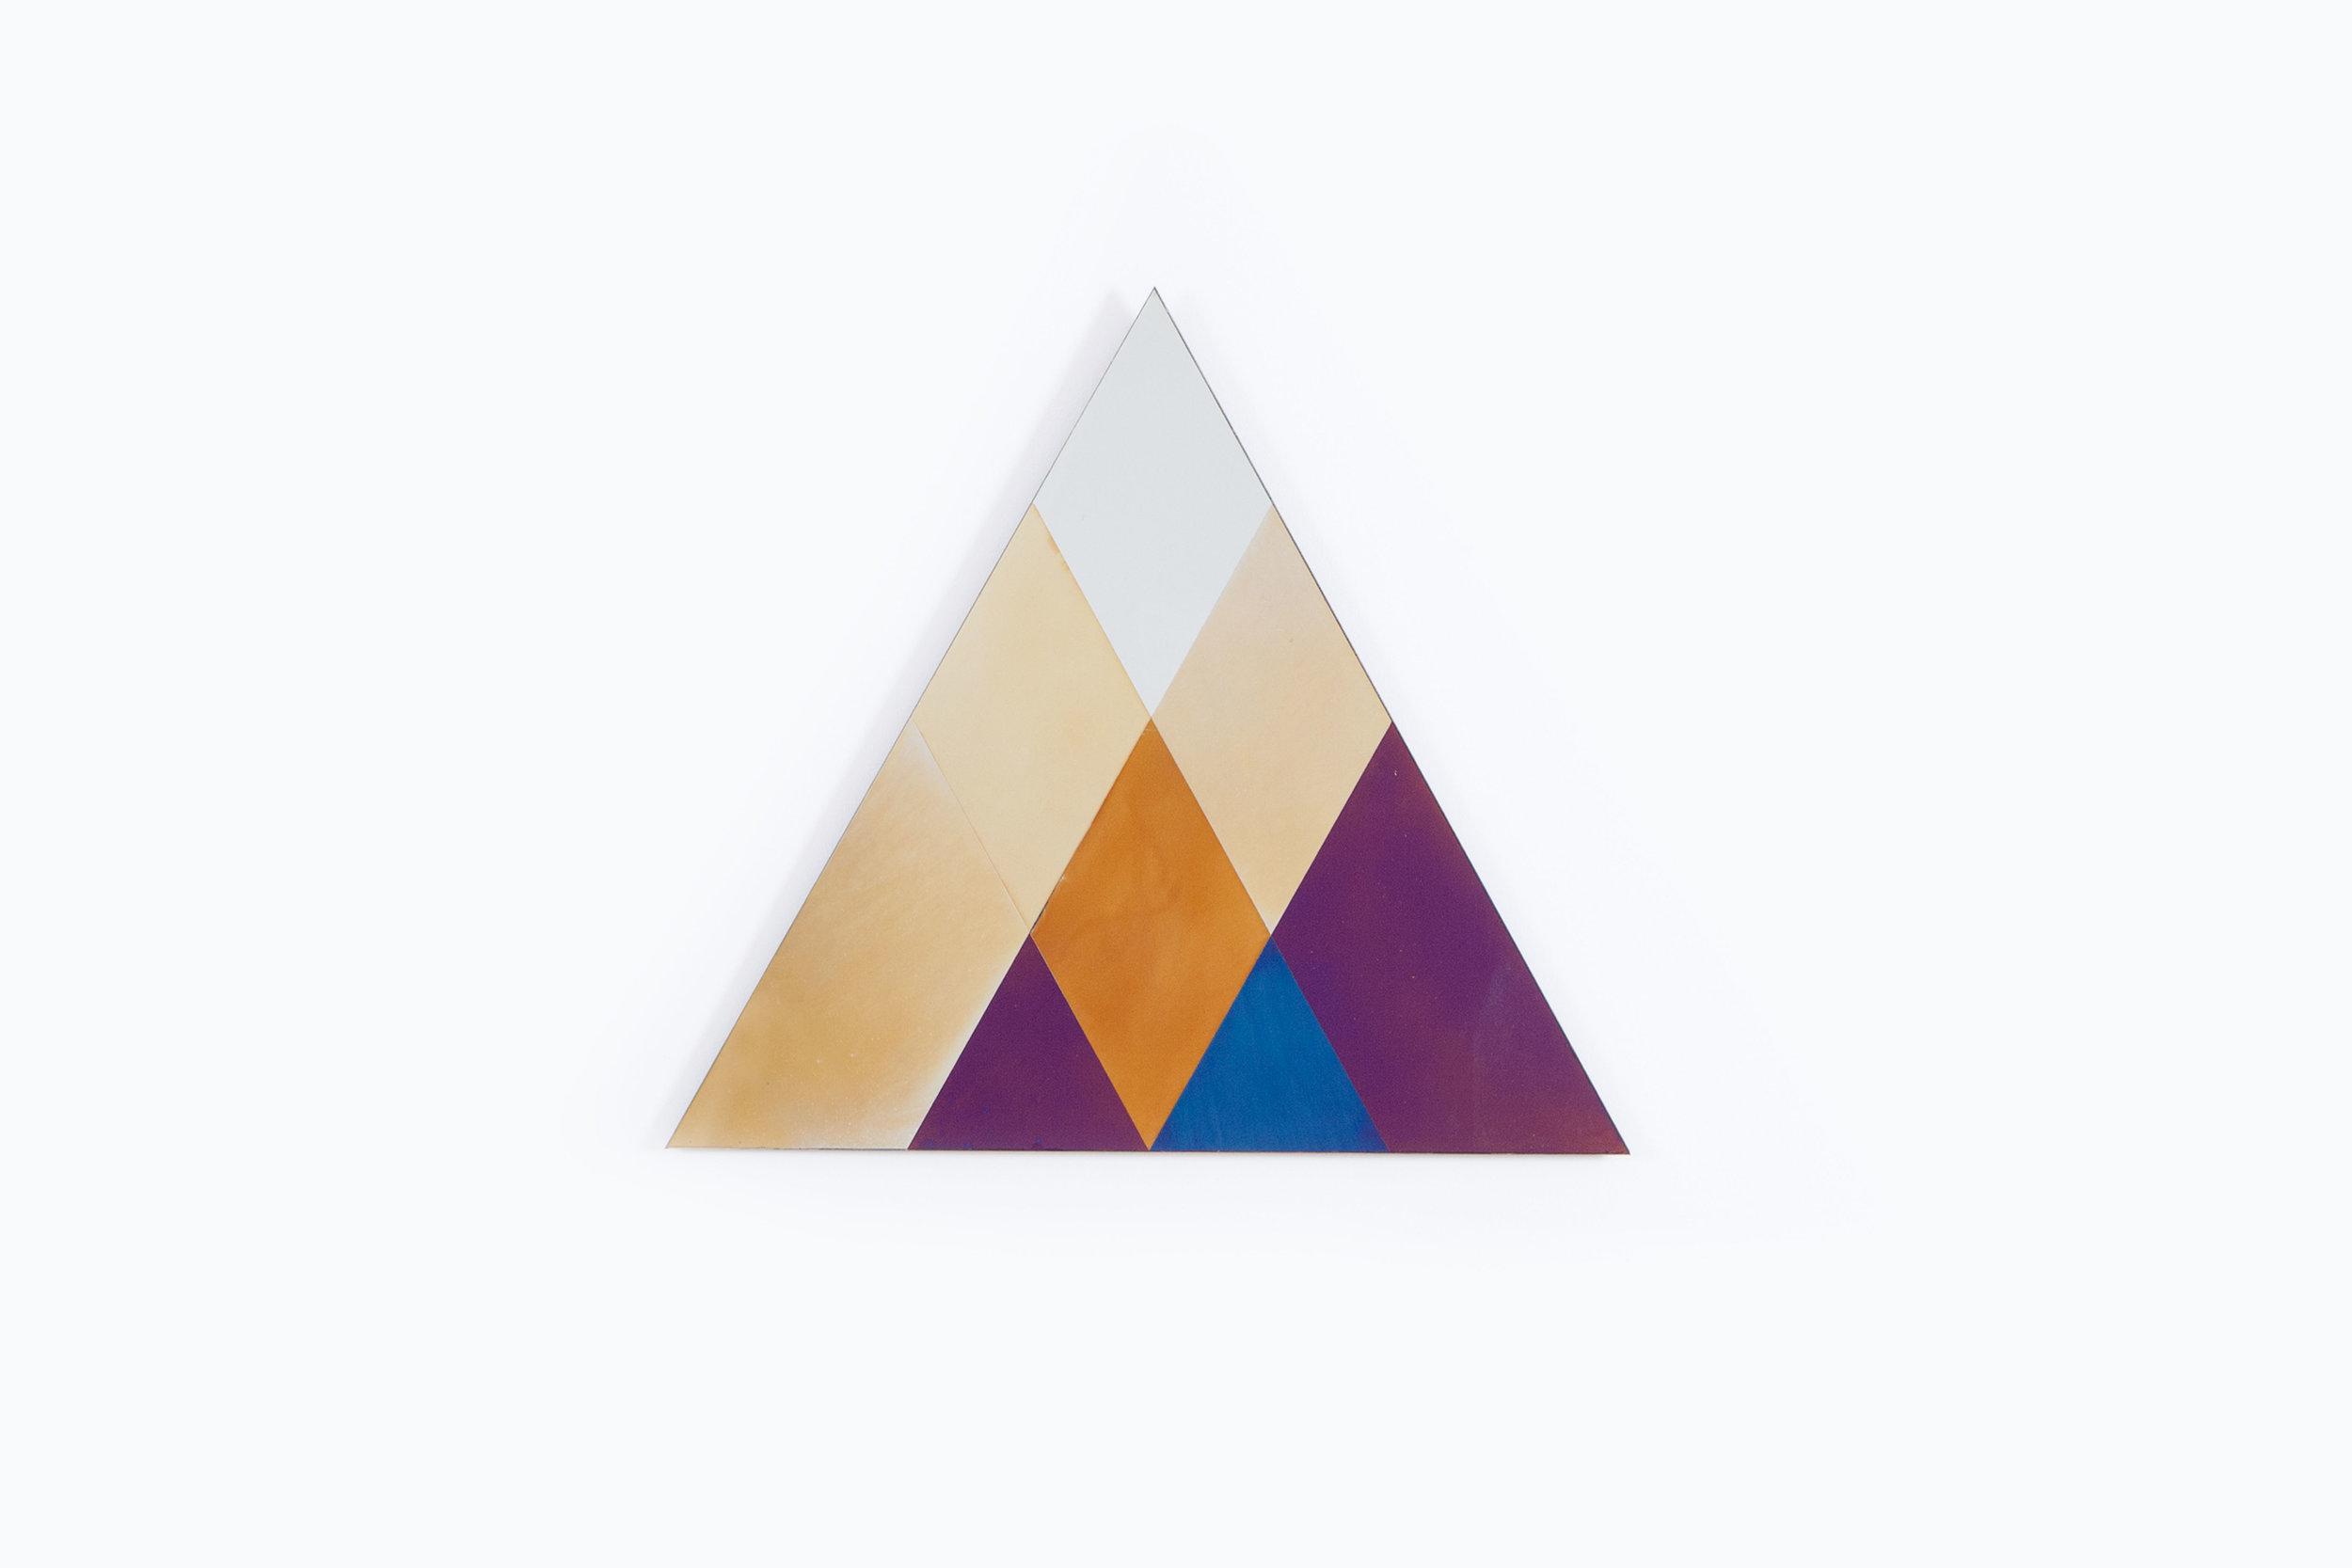 transnatural_Transience_mirror_triangle_byfloorknaapen_87.jpg